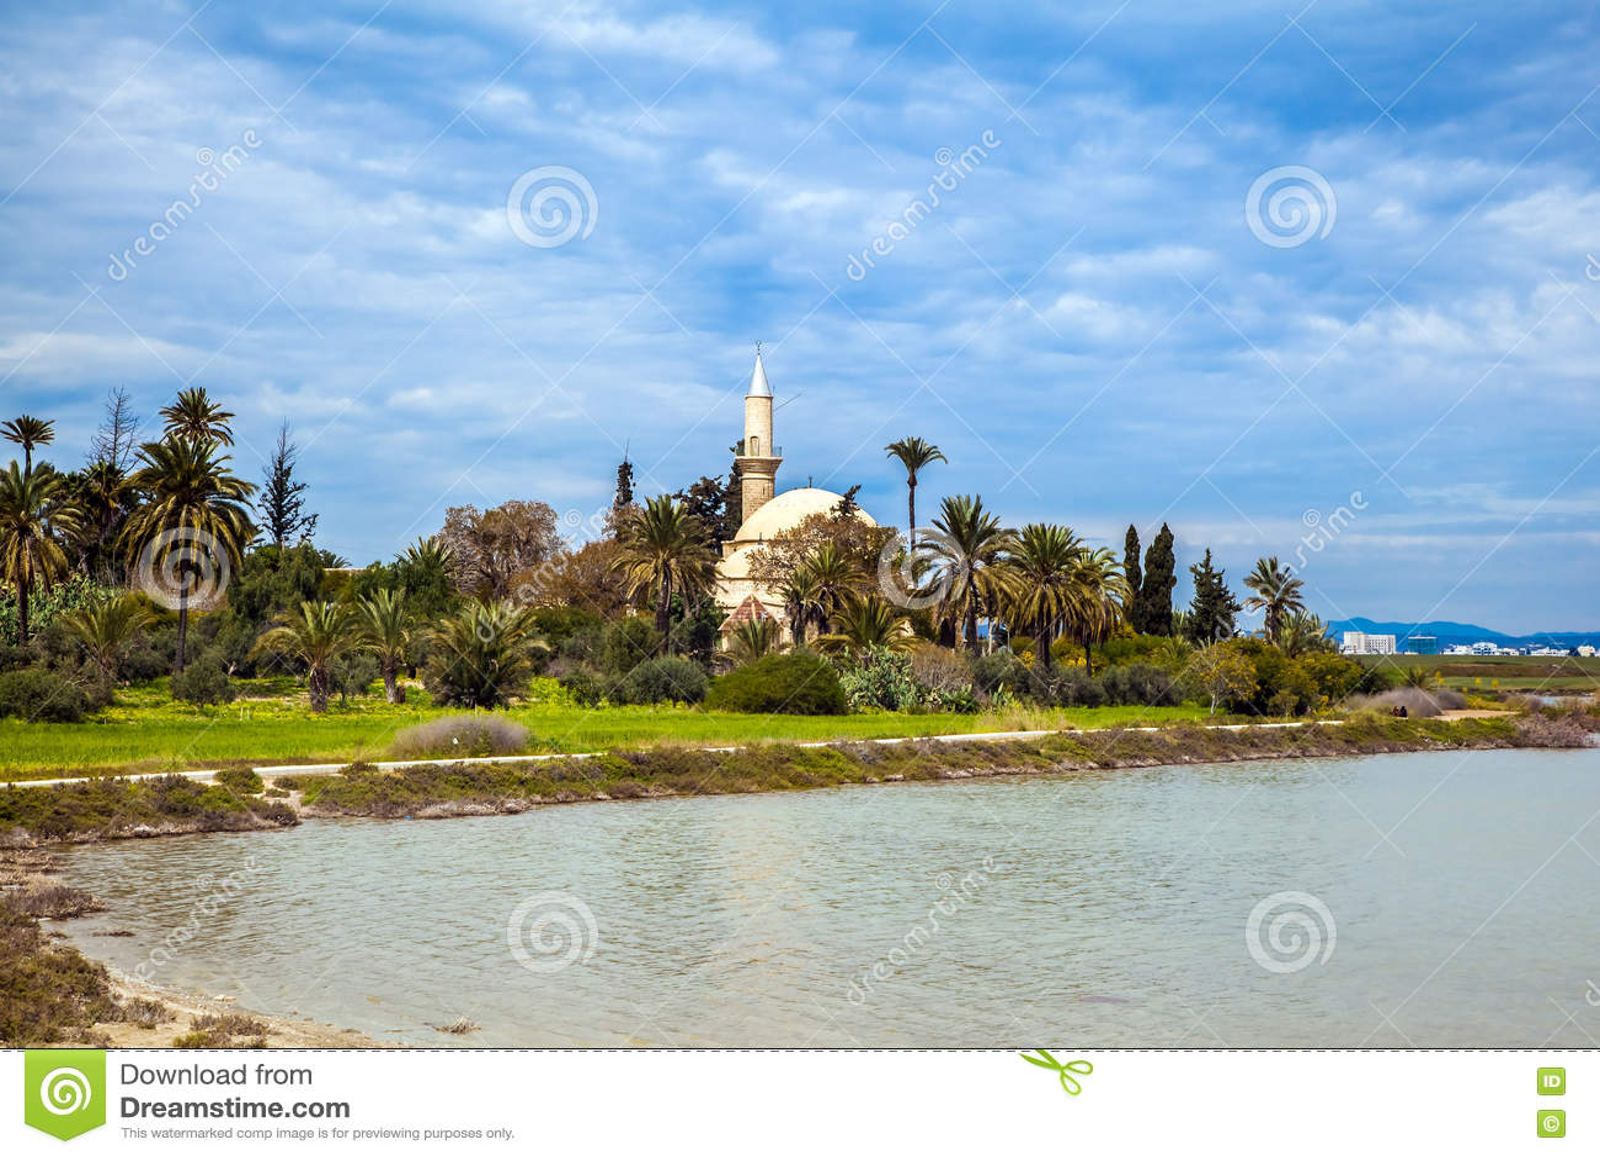 Hala Sultan Tekke ou la mosquée d Umm Haram